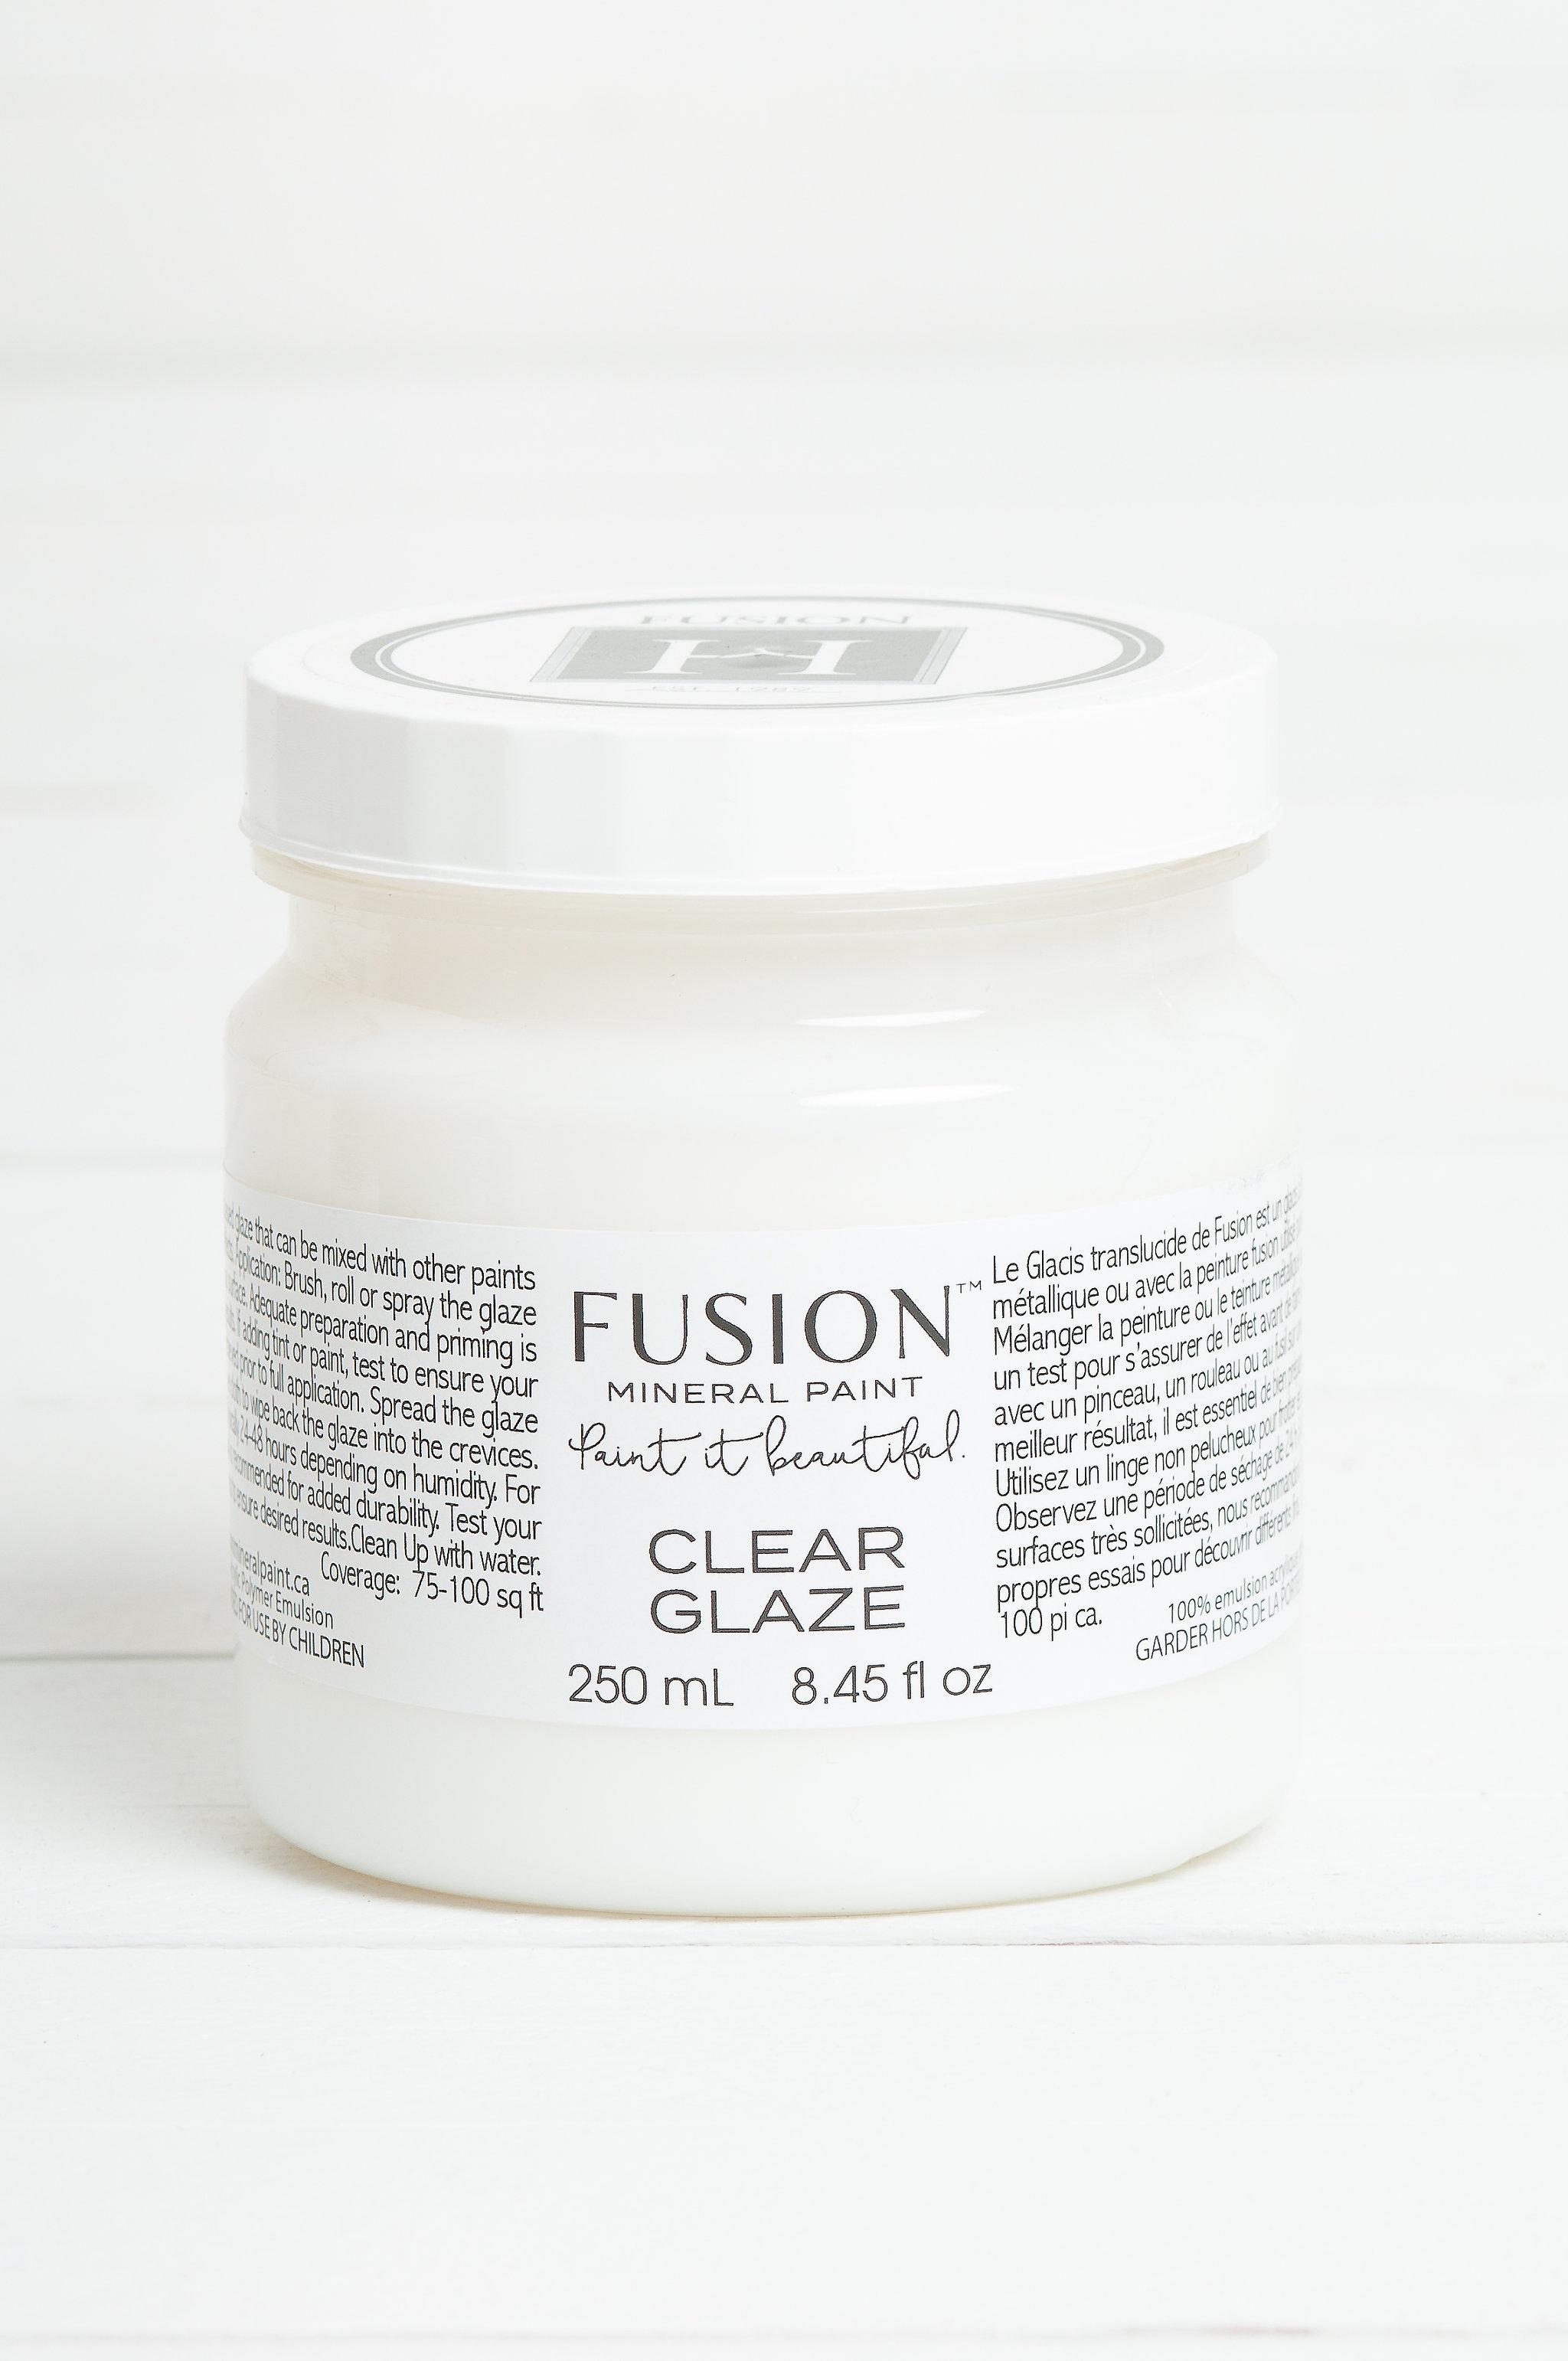 Glaze Fusion Mineral Paint